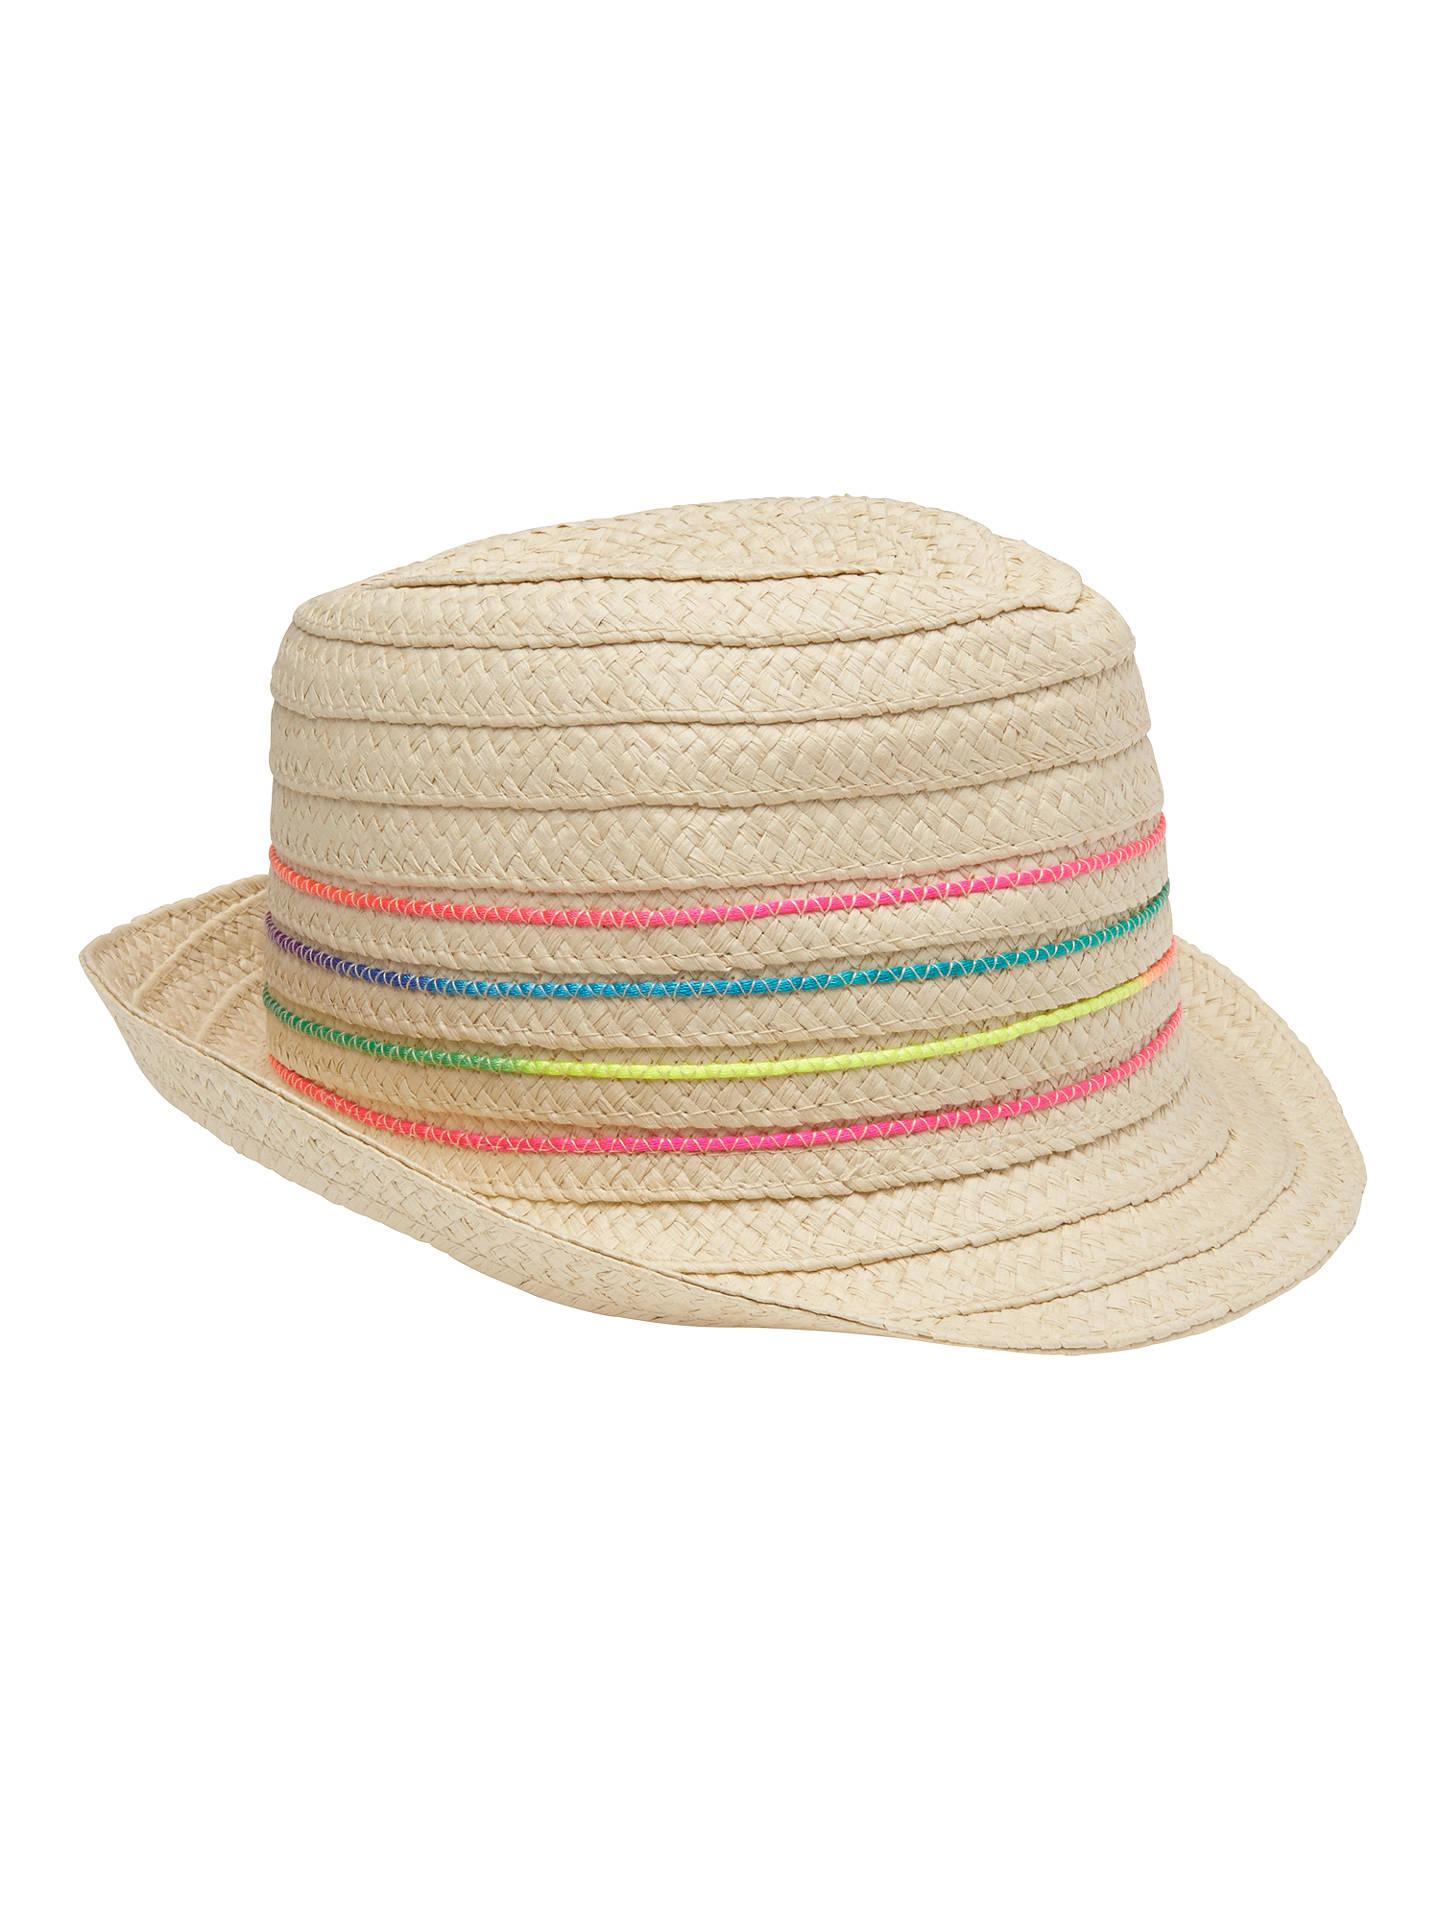 acabb27f1c BuyJohn Lewis Children s Neon Trilby Hat